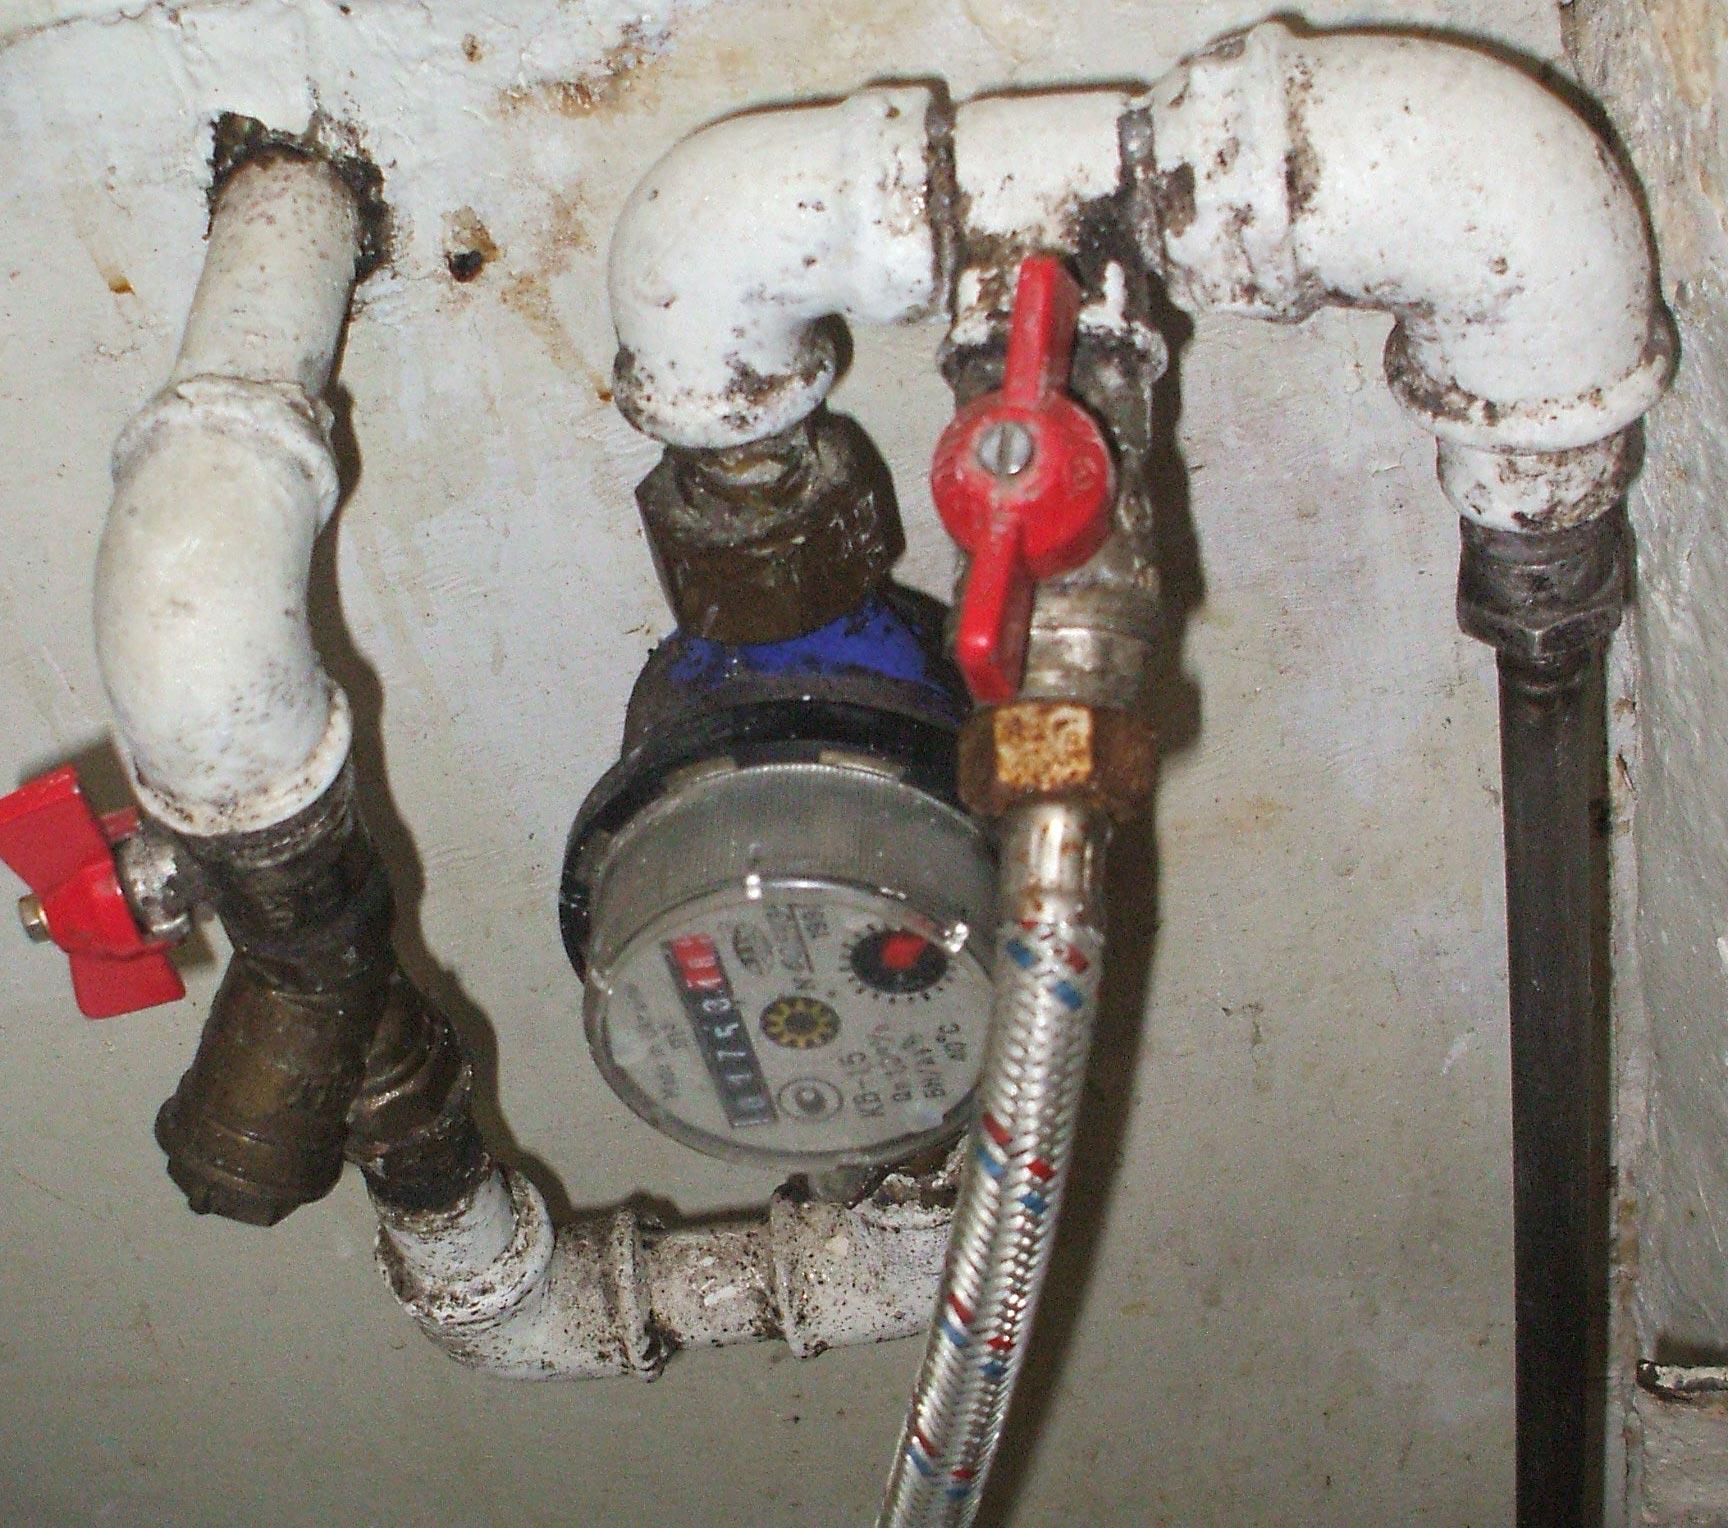 схема установки счетчиков водоснабжения